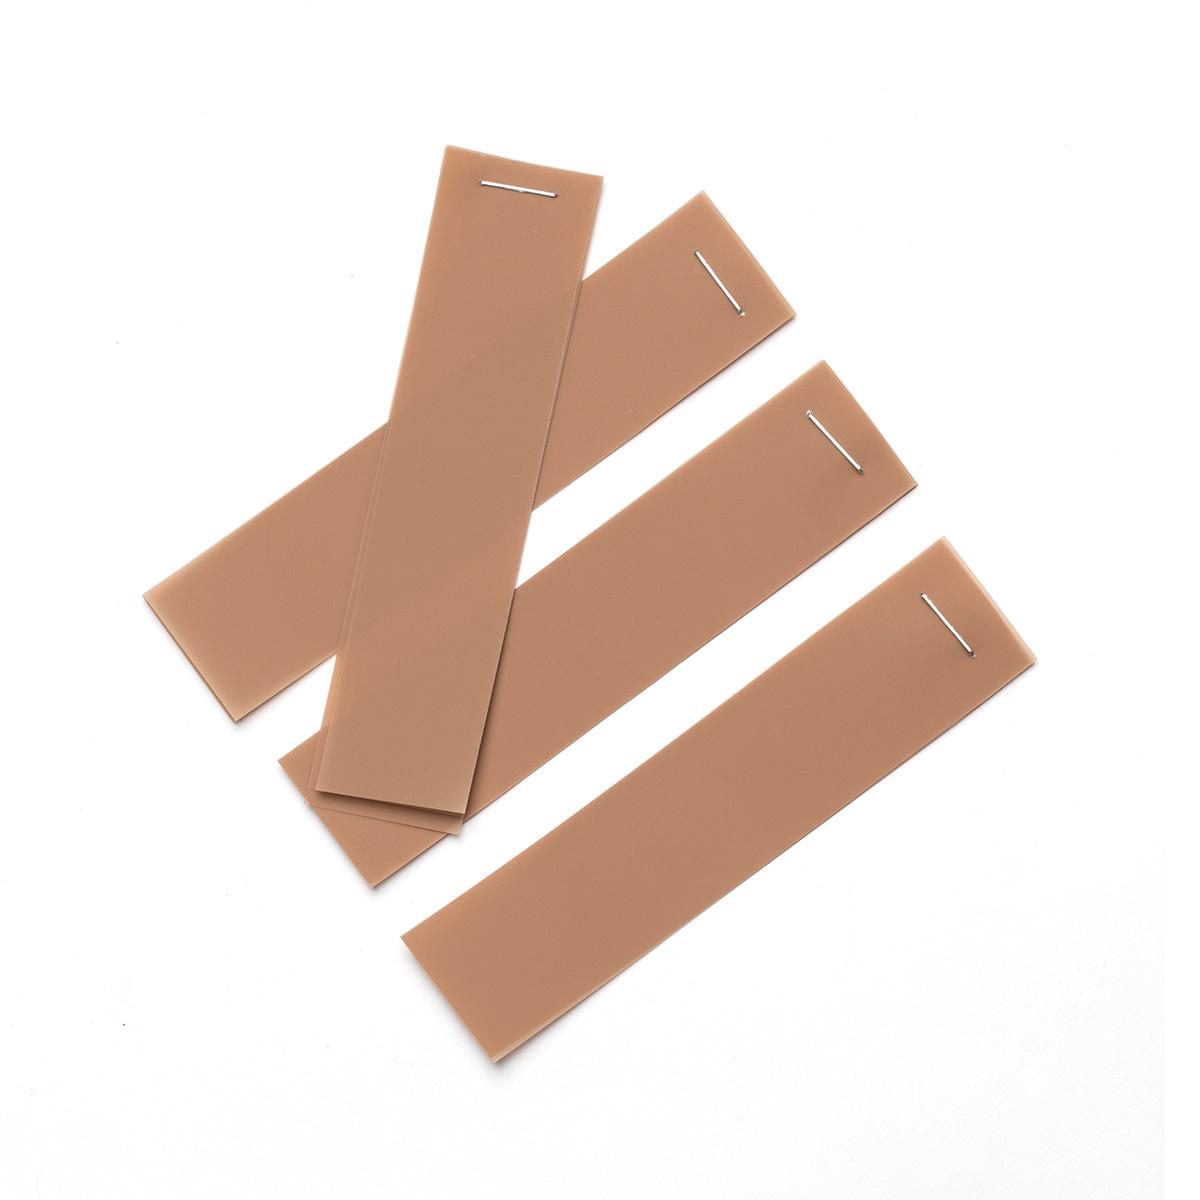 HI4000-70 Halide Polishing Strips (24 pcs.)